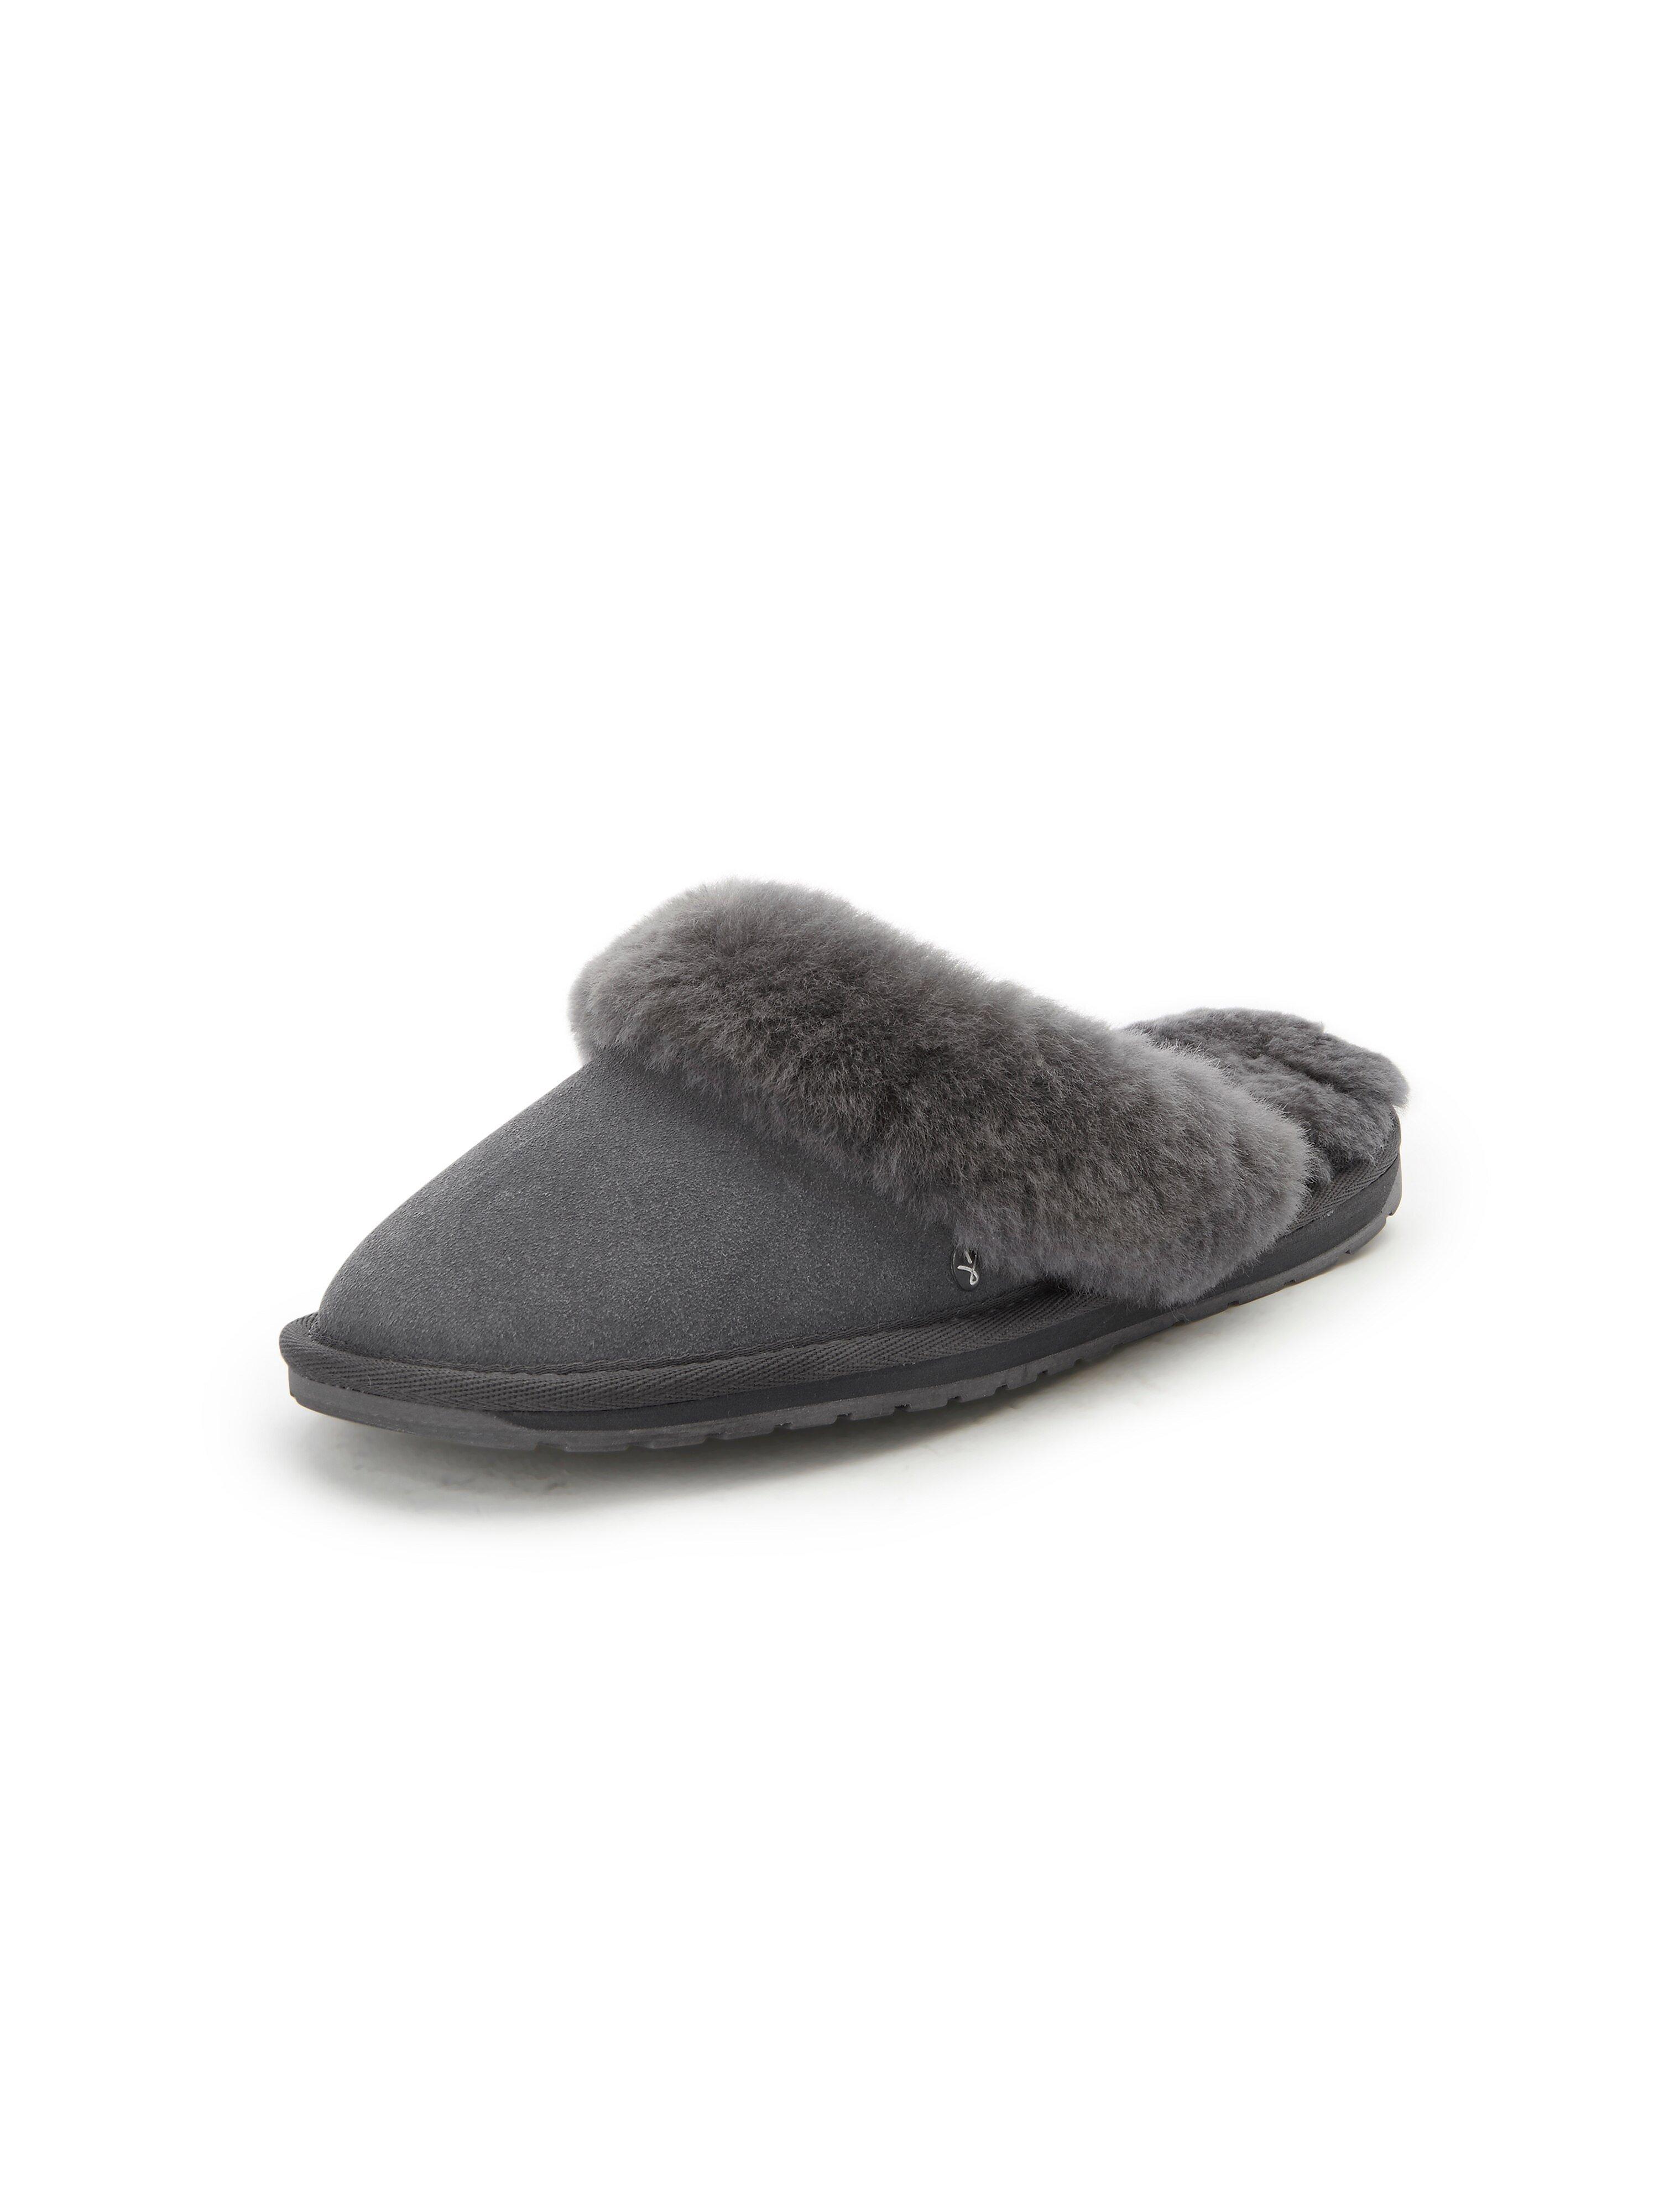 Pantoffels Van Emu grijs